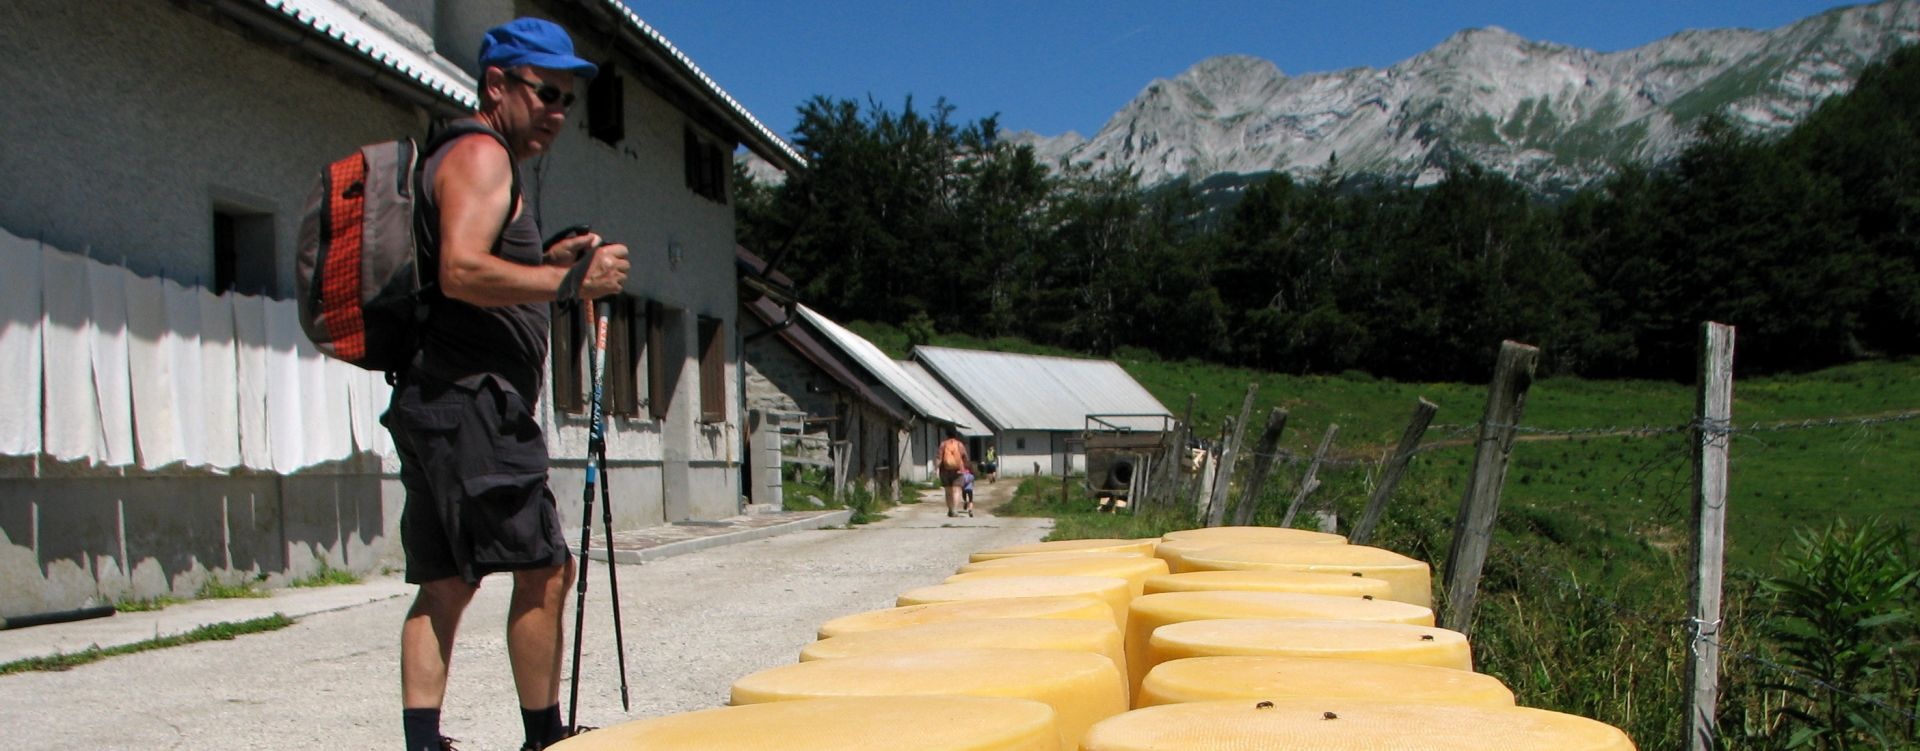 Alpine pasture Soca valley Slovenia